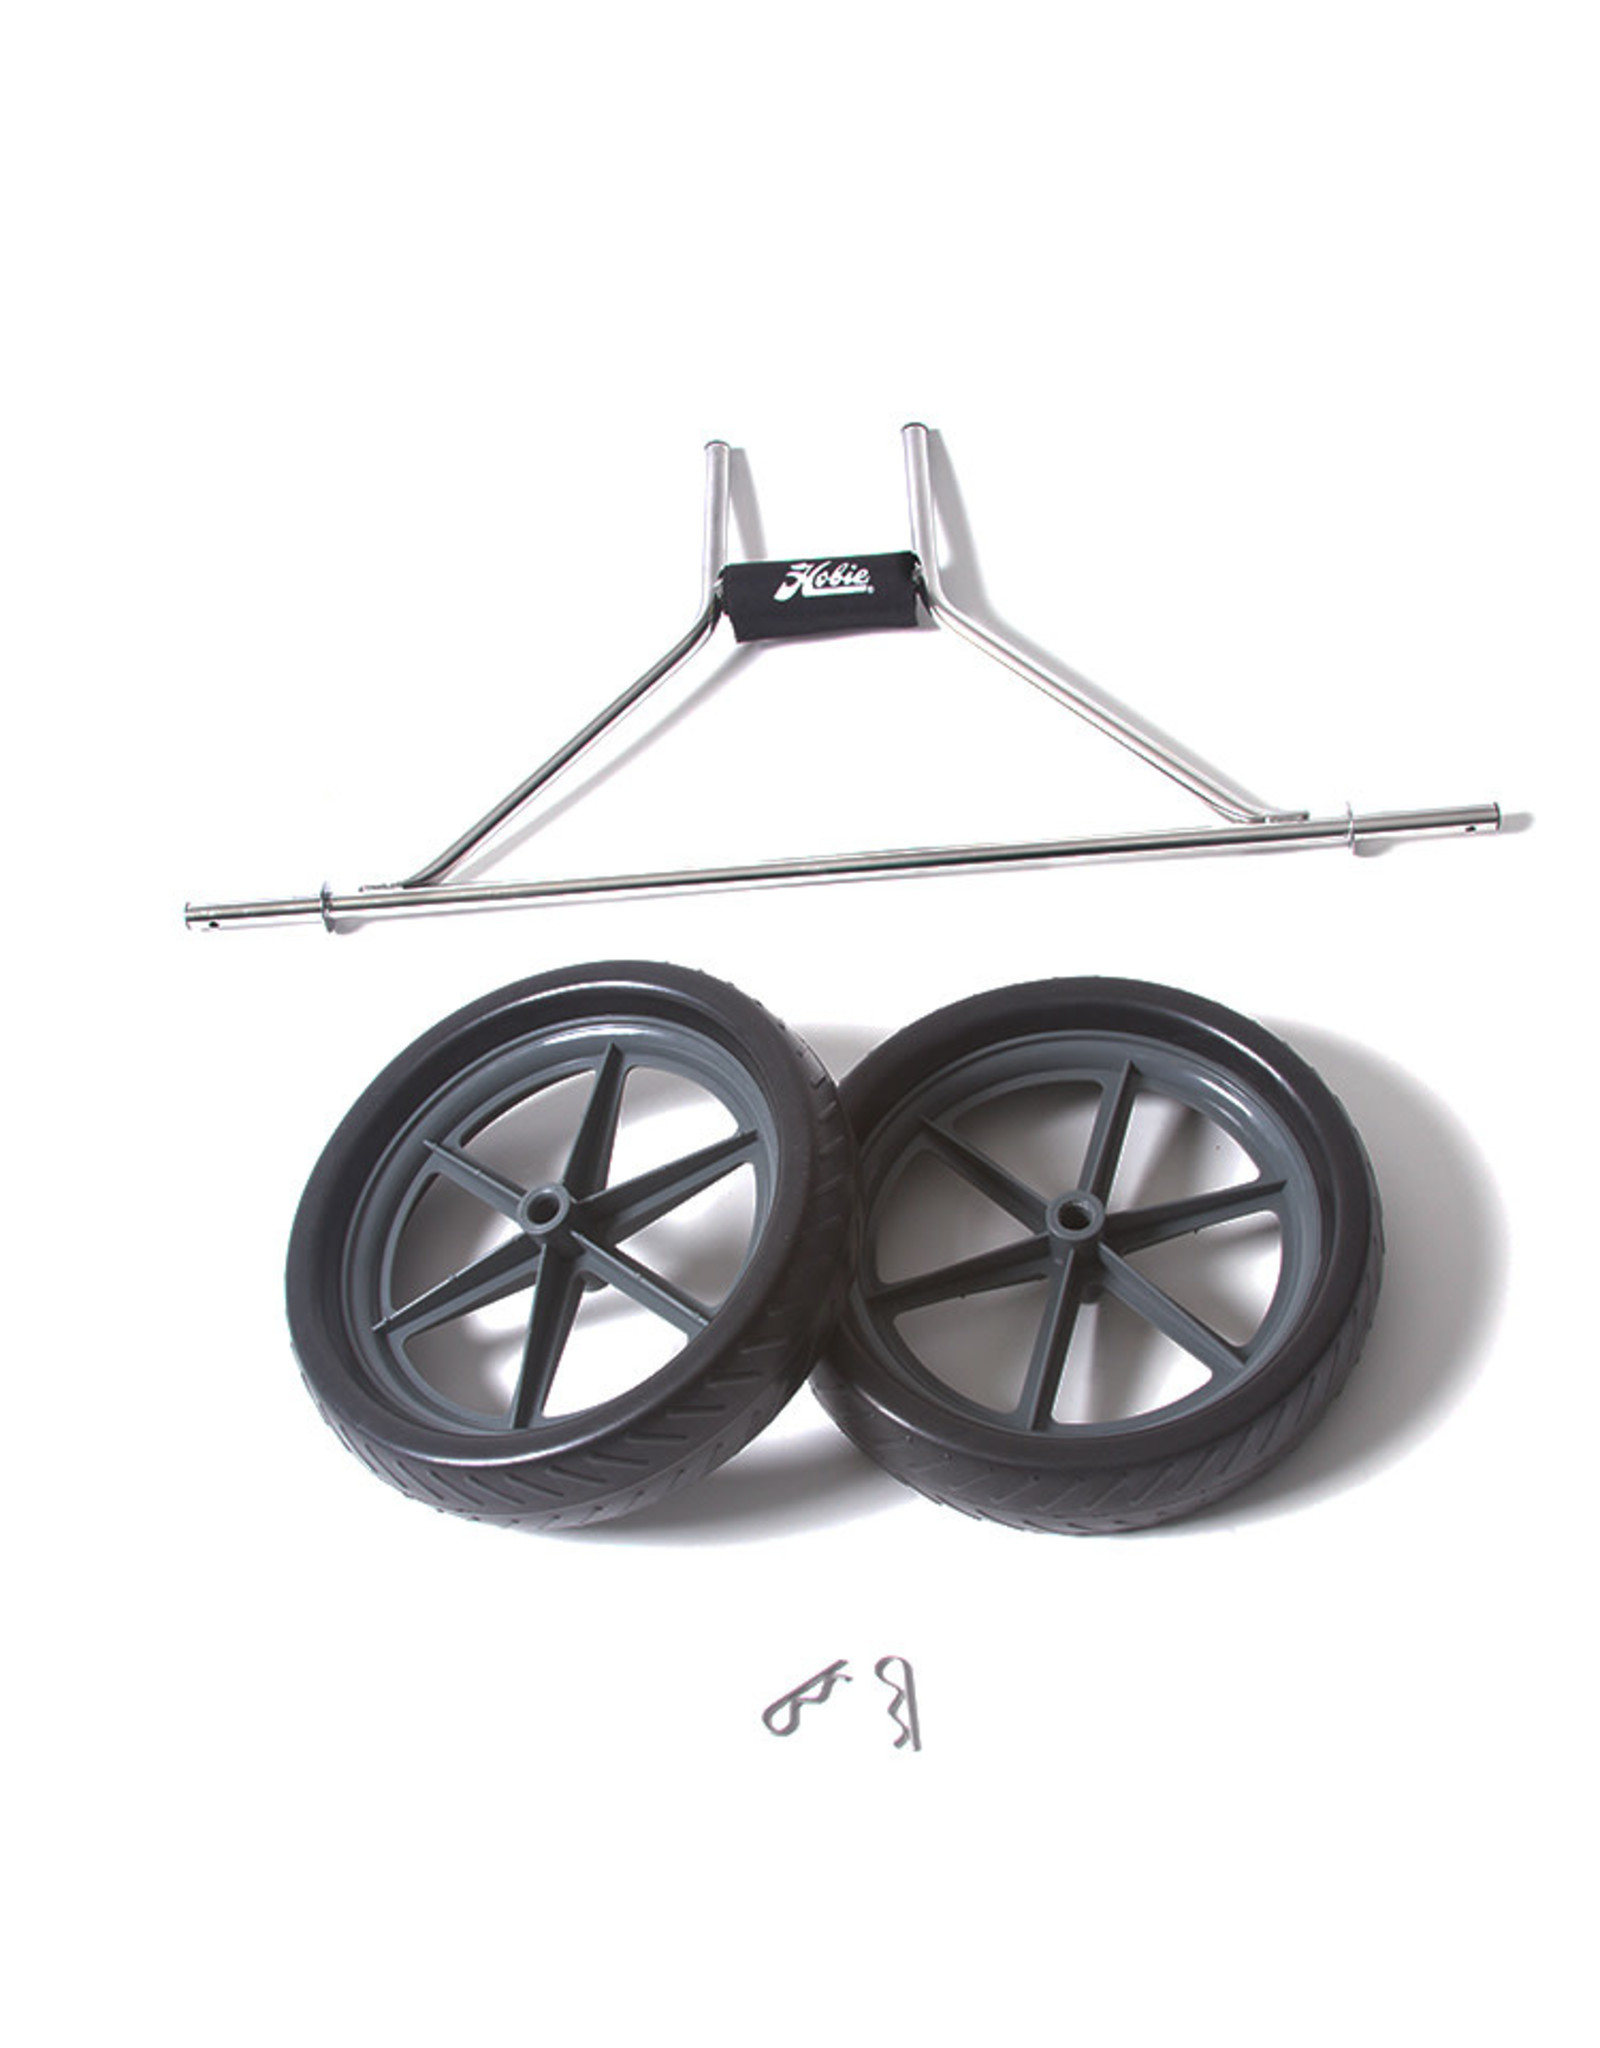 Hobie Hobie I-Series / Eclipse Plug-In Cart